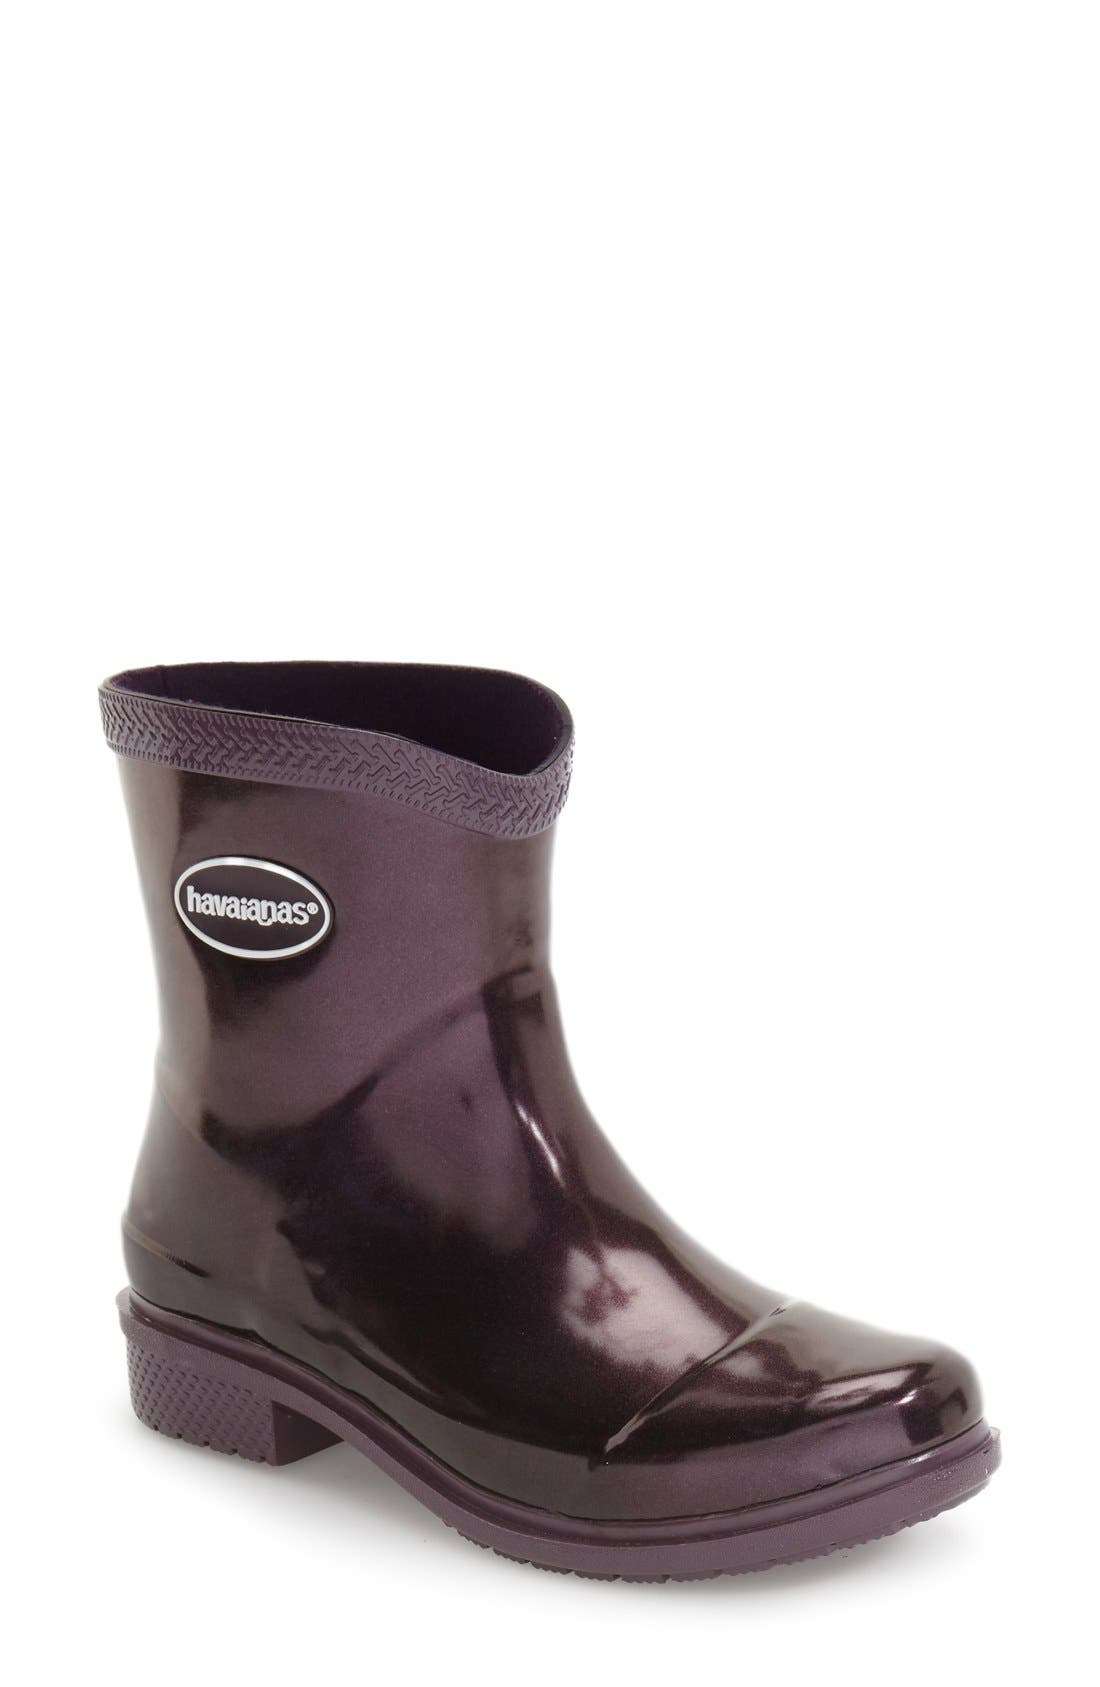 Havaianas 'Galochas Low Metallic' Waterproof Rain Boot (Women)